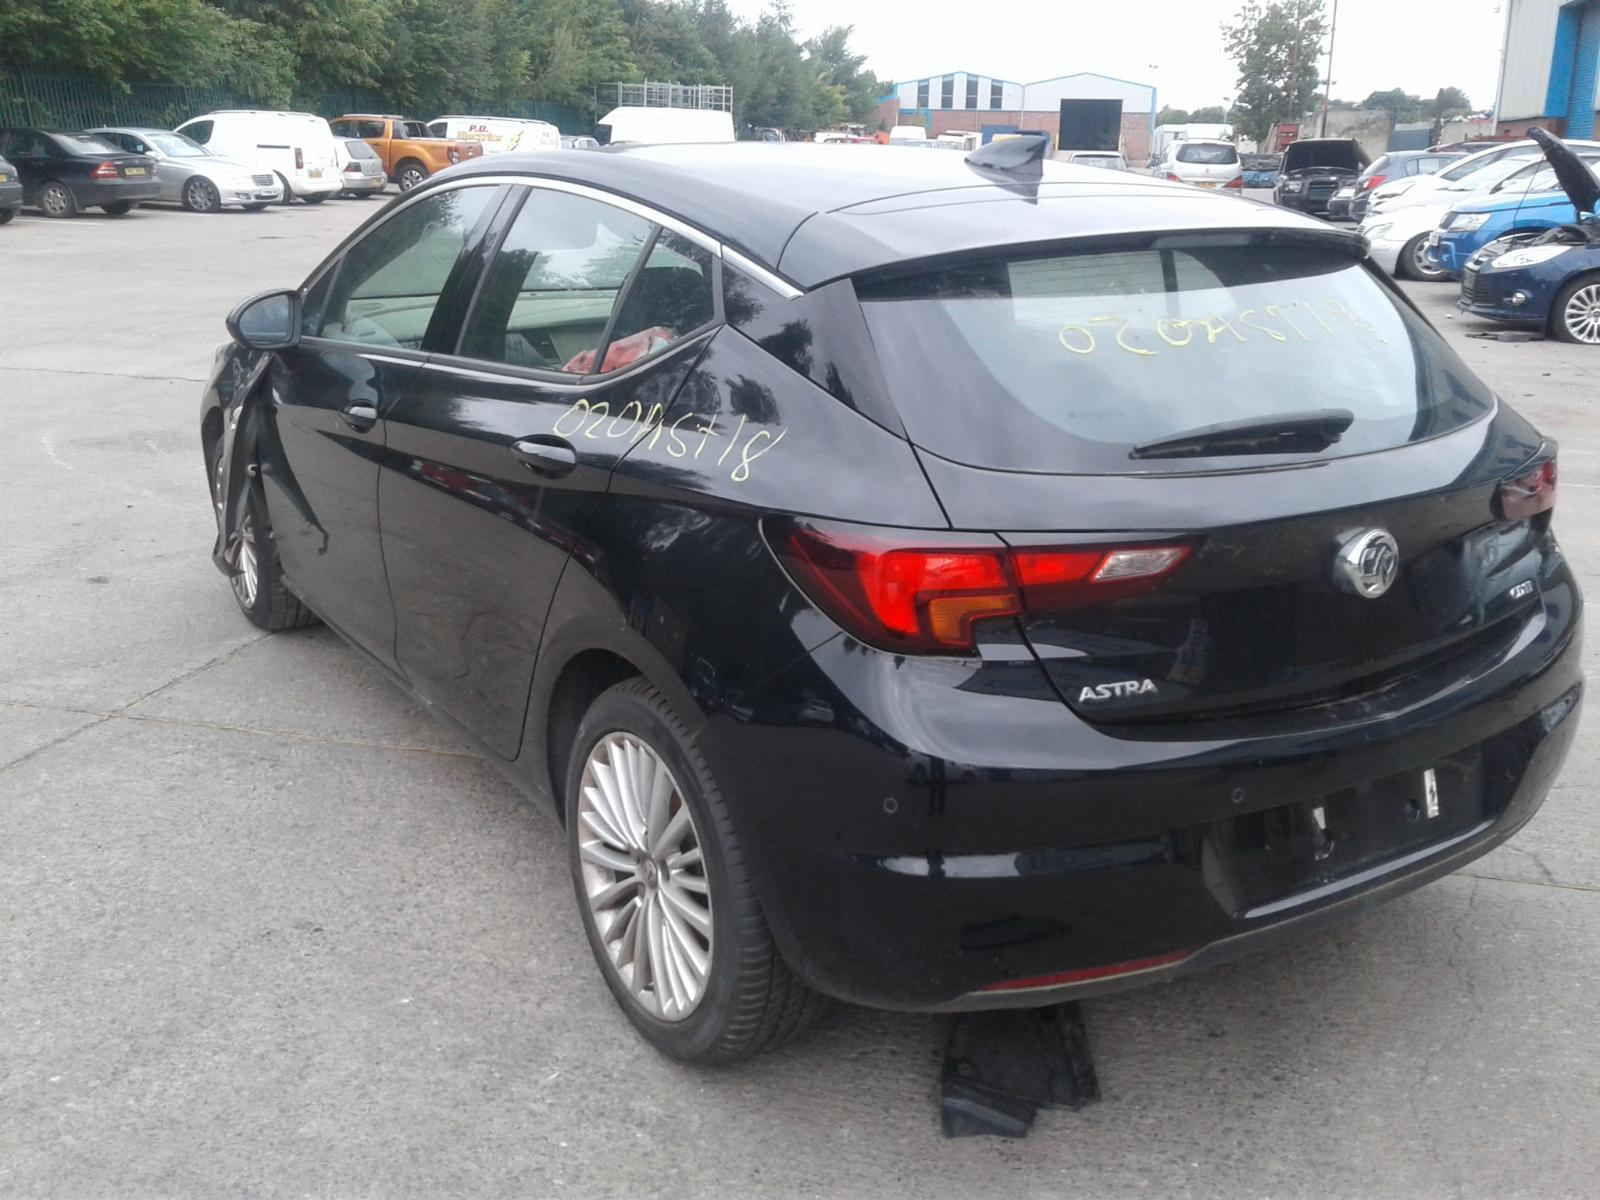 2017 Vauxhall ASTRA ELITE NAV CDTI S/S  COMP FRONT Image